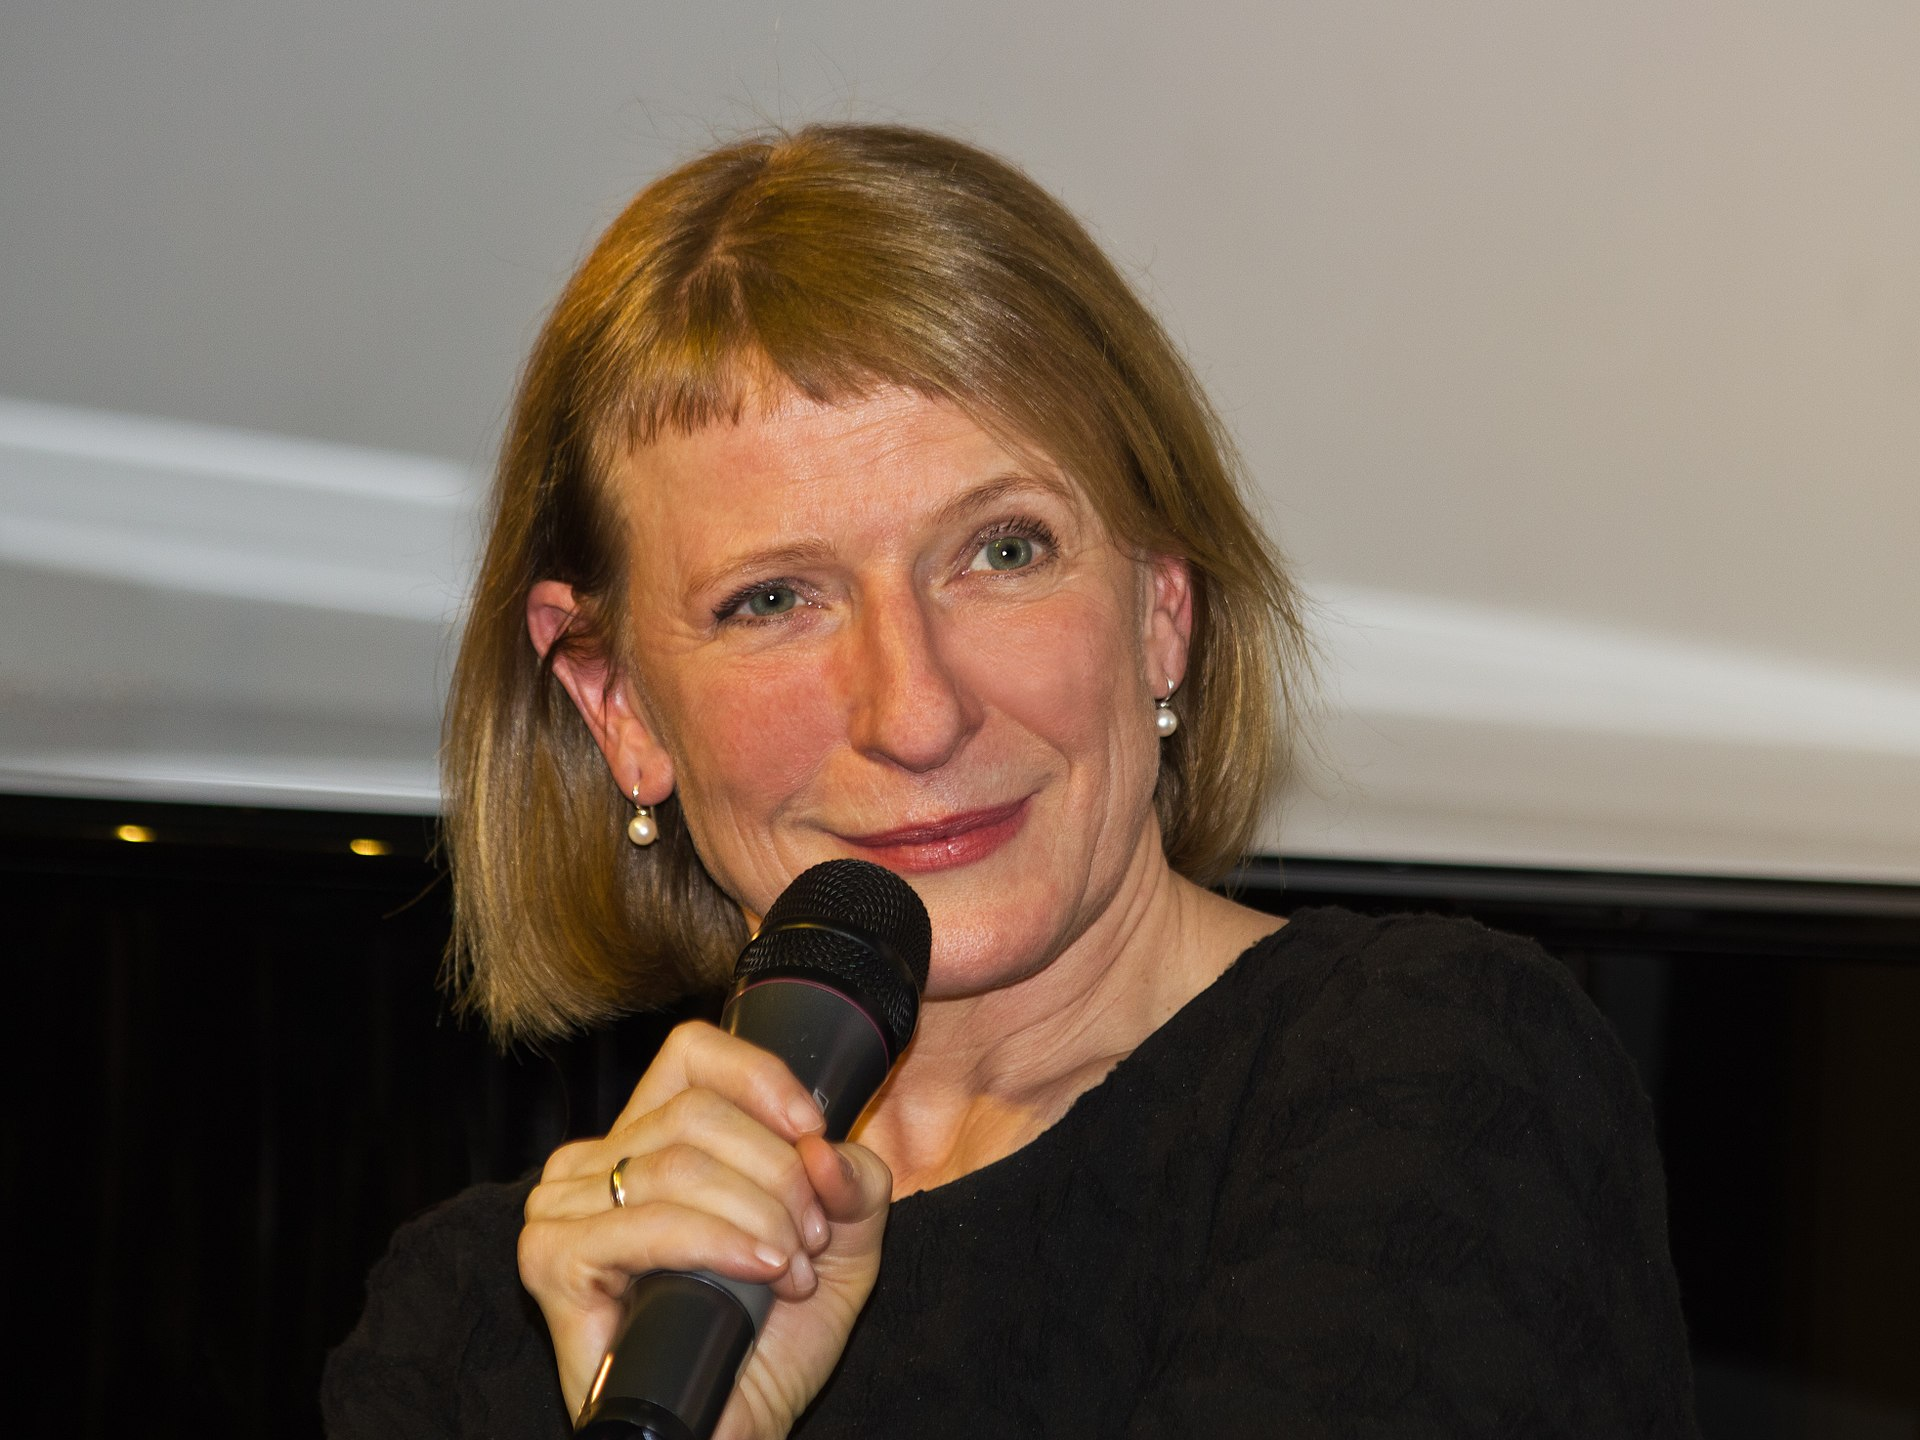 Dagmar Manzel - Wikipedia